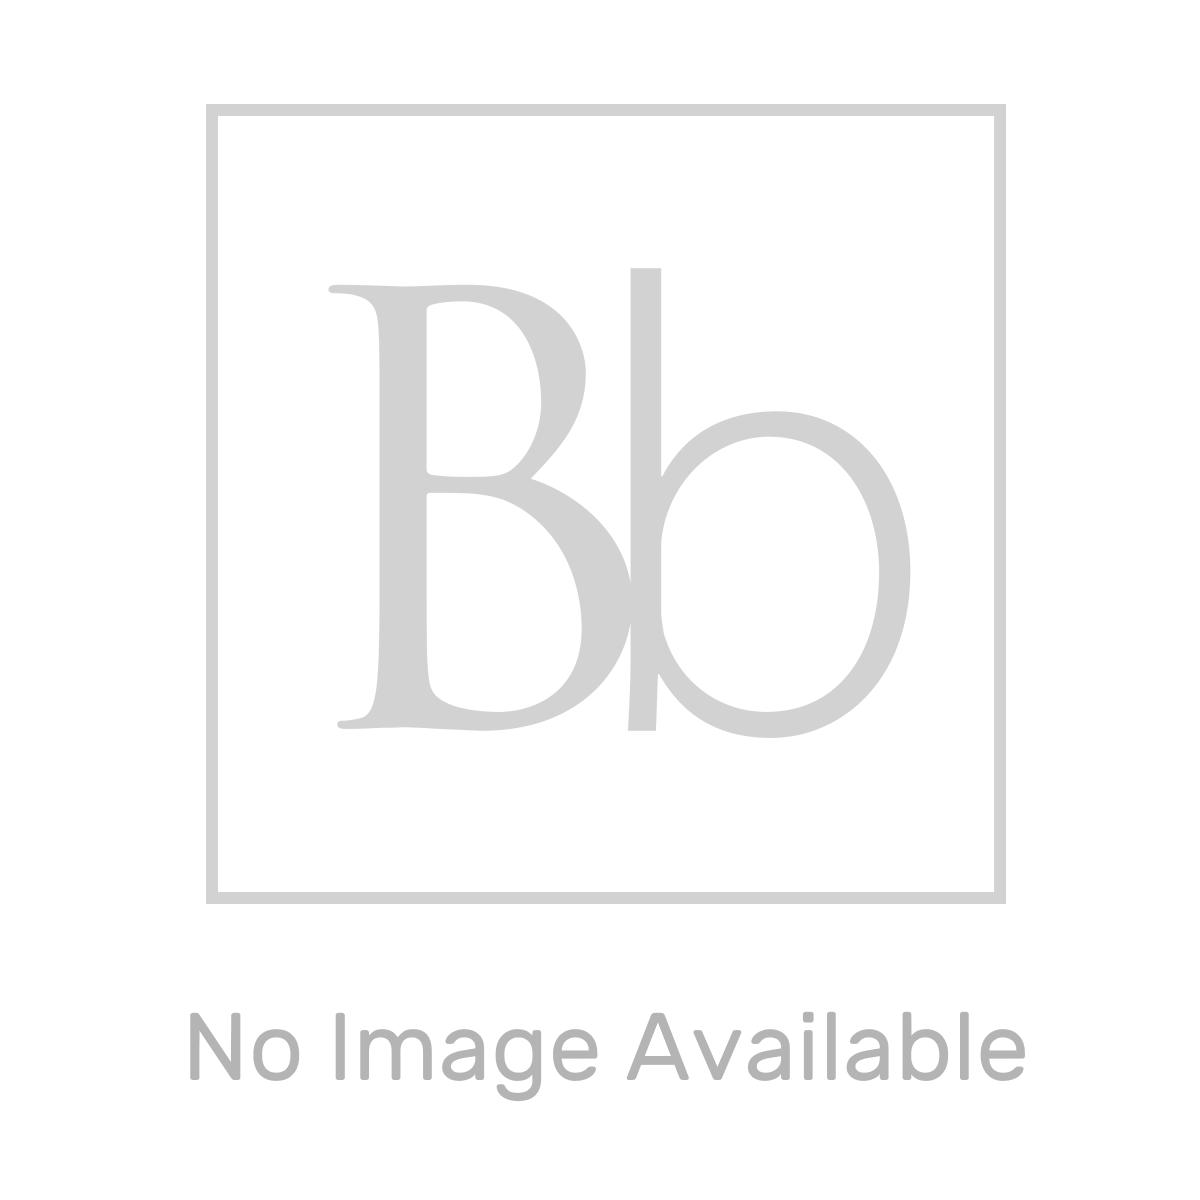 Nuie Athena Hacienda Black 2 Drawer Floor Standing Vanity Unit with 18mm Profile Basin 600mm Line Drawing